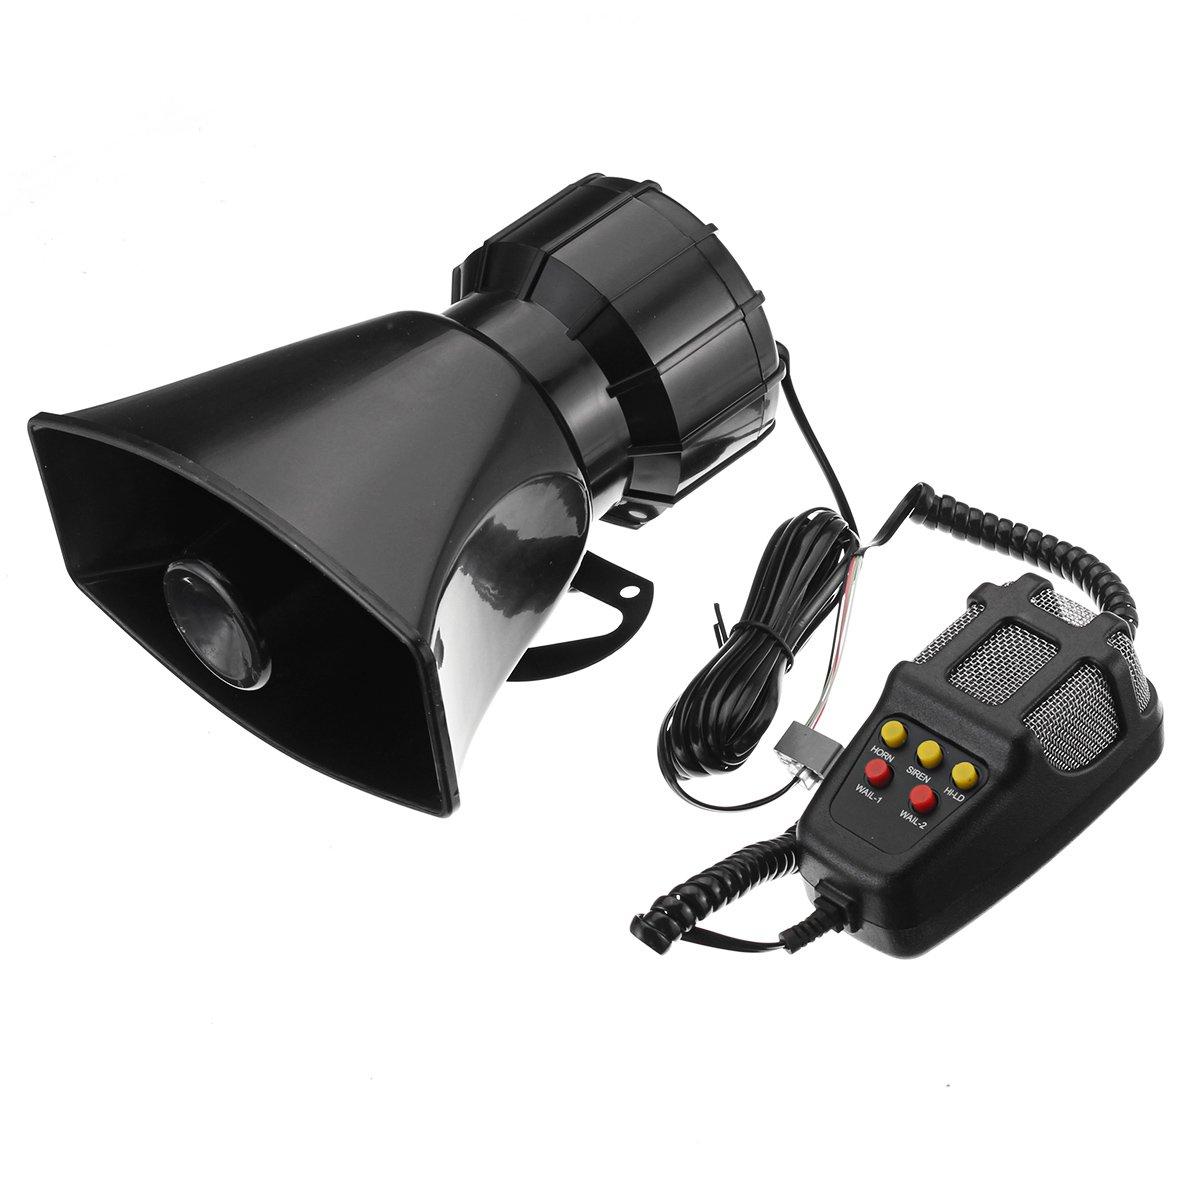 100W Car Warning Alarm 5 Sound Loudly Police Fire Siren Horn PA Speaker with Mic GodsKingdom 7111263229039